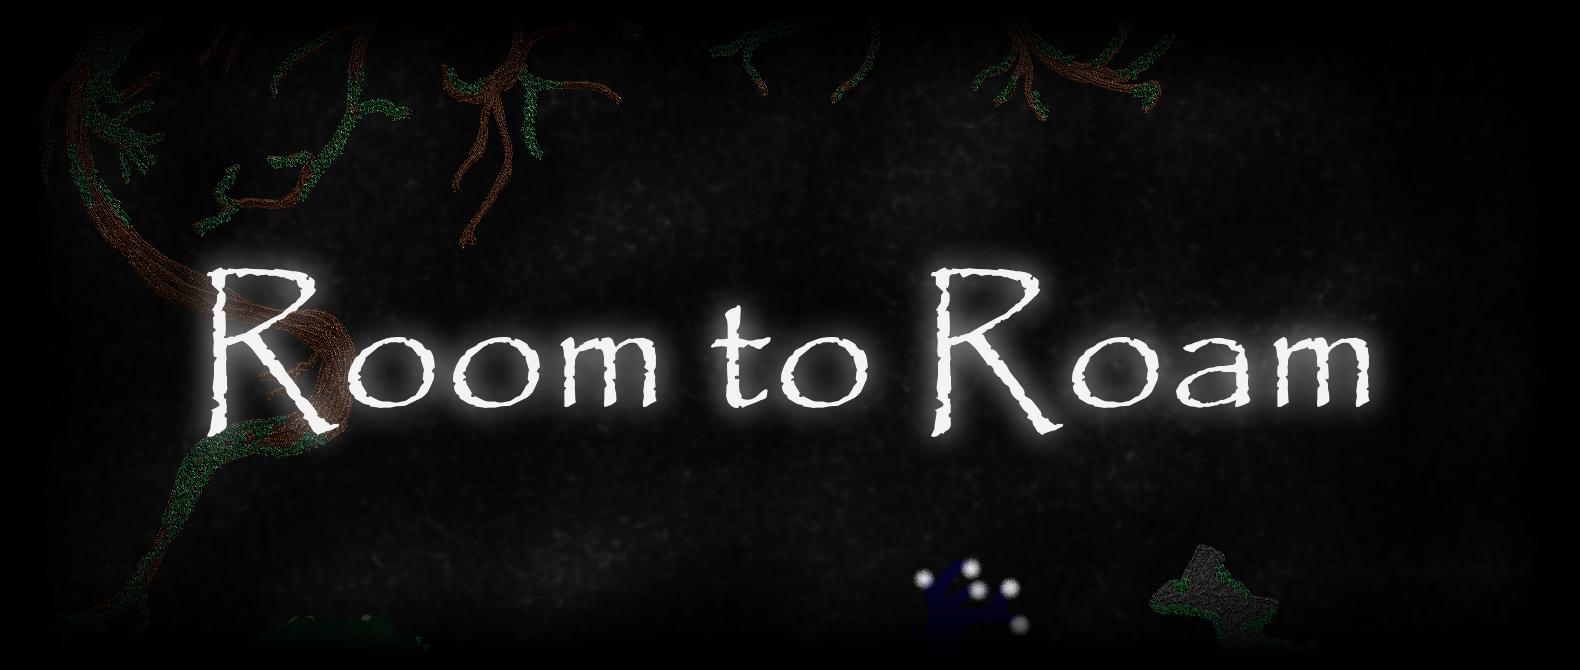 Room to Roam: Bare-Bones Edition